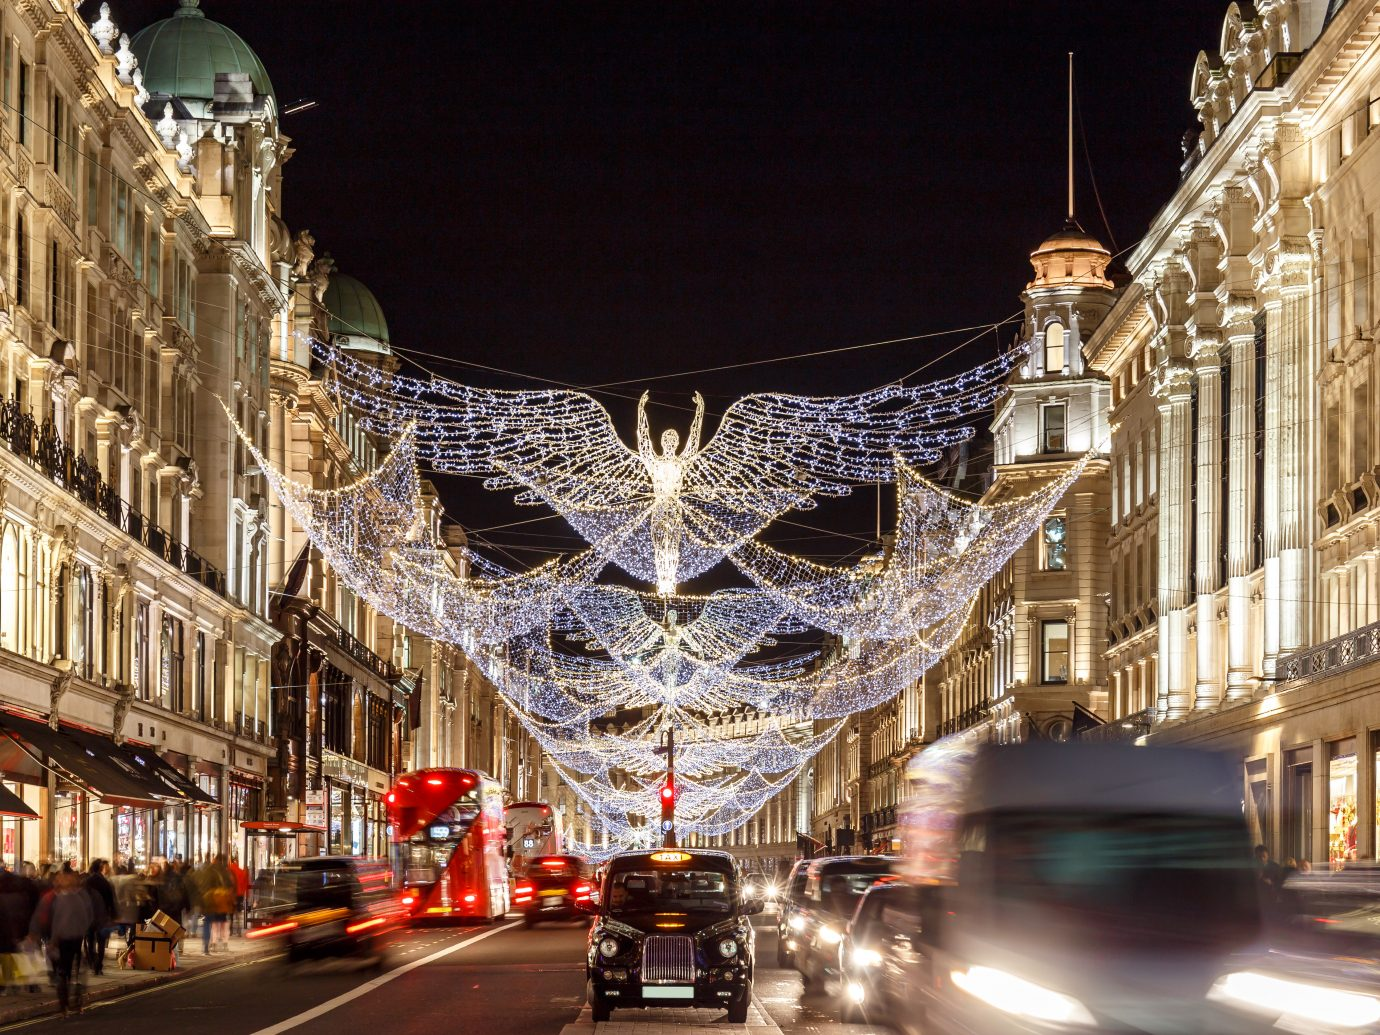 Christmas lights 2016 in Mayfair, London, England